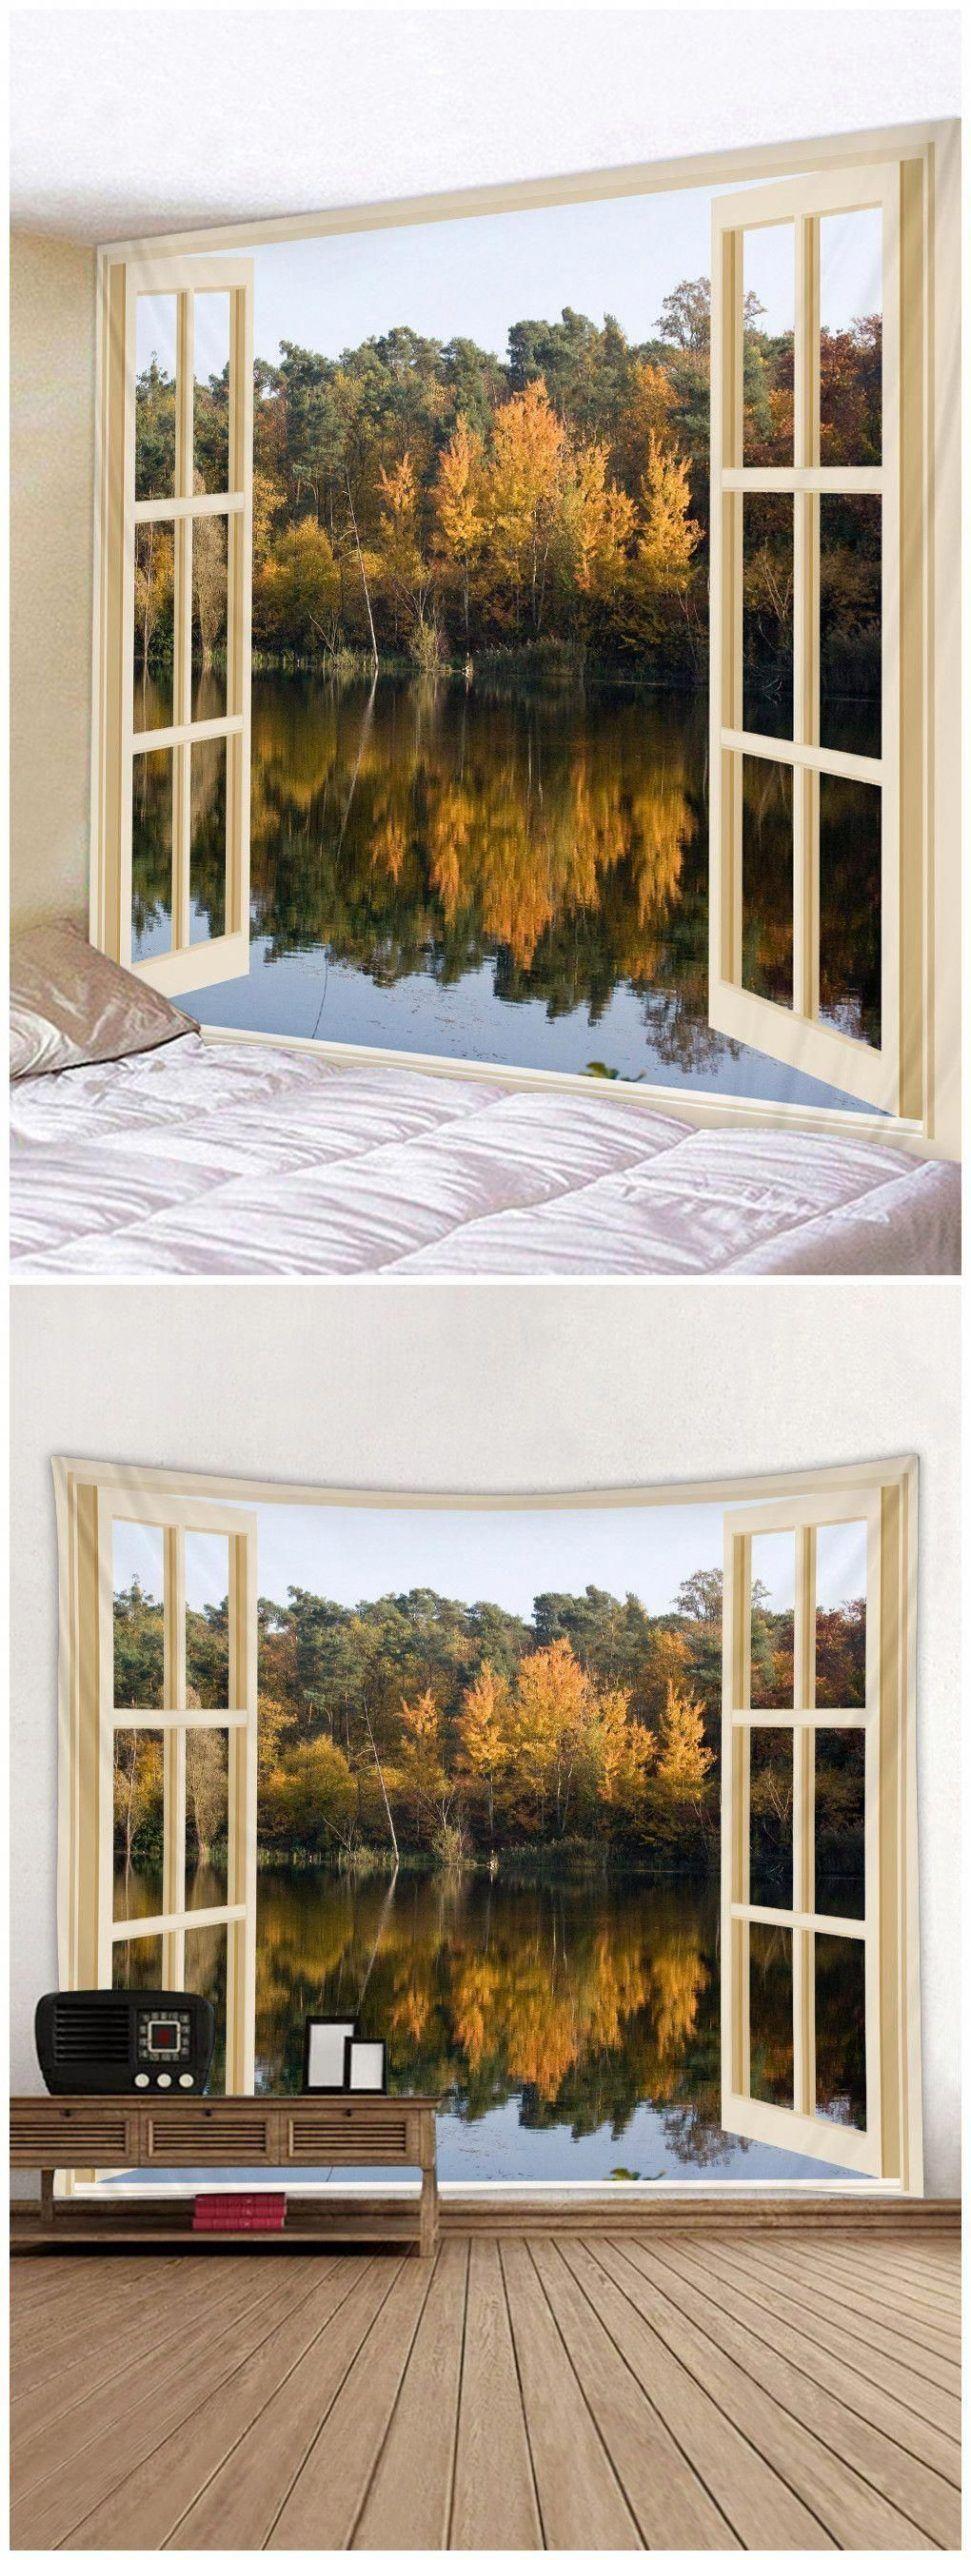 $15.95 Forest Tree Print Tapestry Art Decoration living room ideas, bedroom ide   wall decor bedroom master window treatments #art #bedroom #decoration #forest #ide #ideas #living #print #room #tapestry #tree